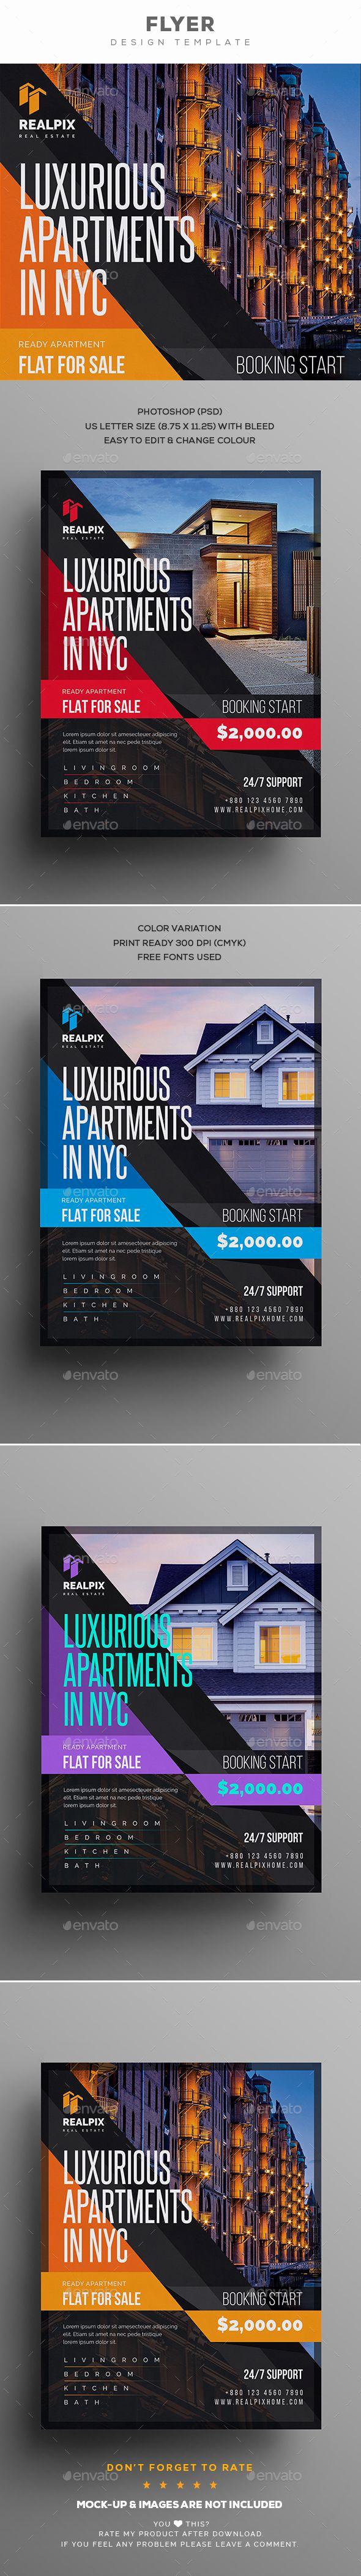 Real Estate Flyer Ideas Luxury Best 25 Real Estate Flyers Ideas On Pinterest